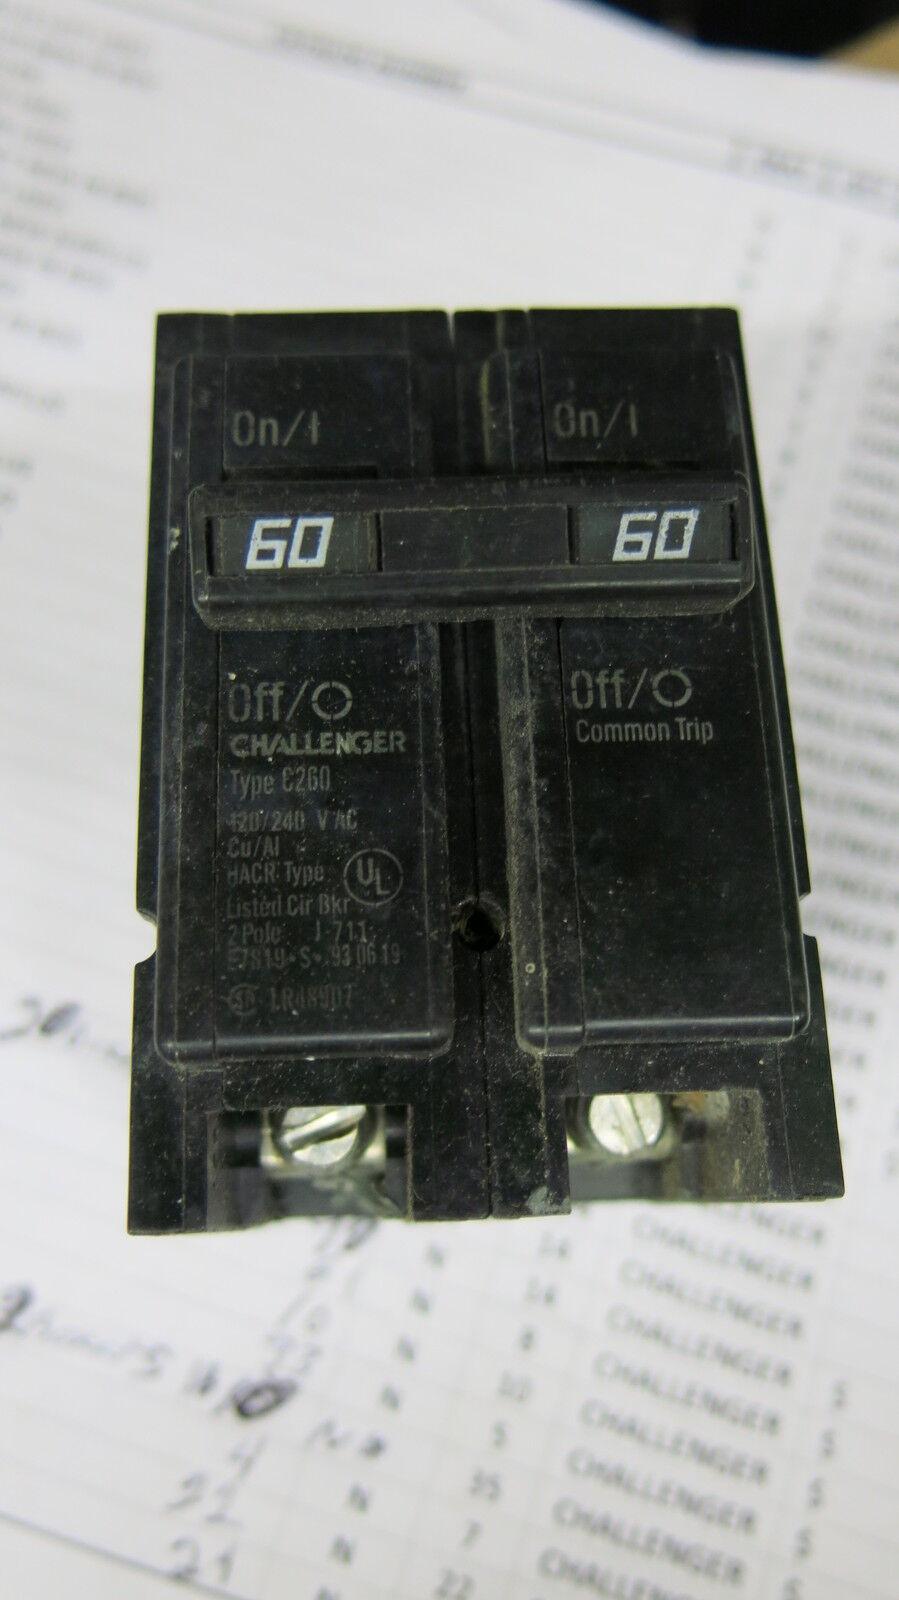 Challenger Home Fuse Box Schematics Diagram 1973 Dodge Dart 60 Amp 2 Pole Circuit Breaker C260 Ebay